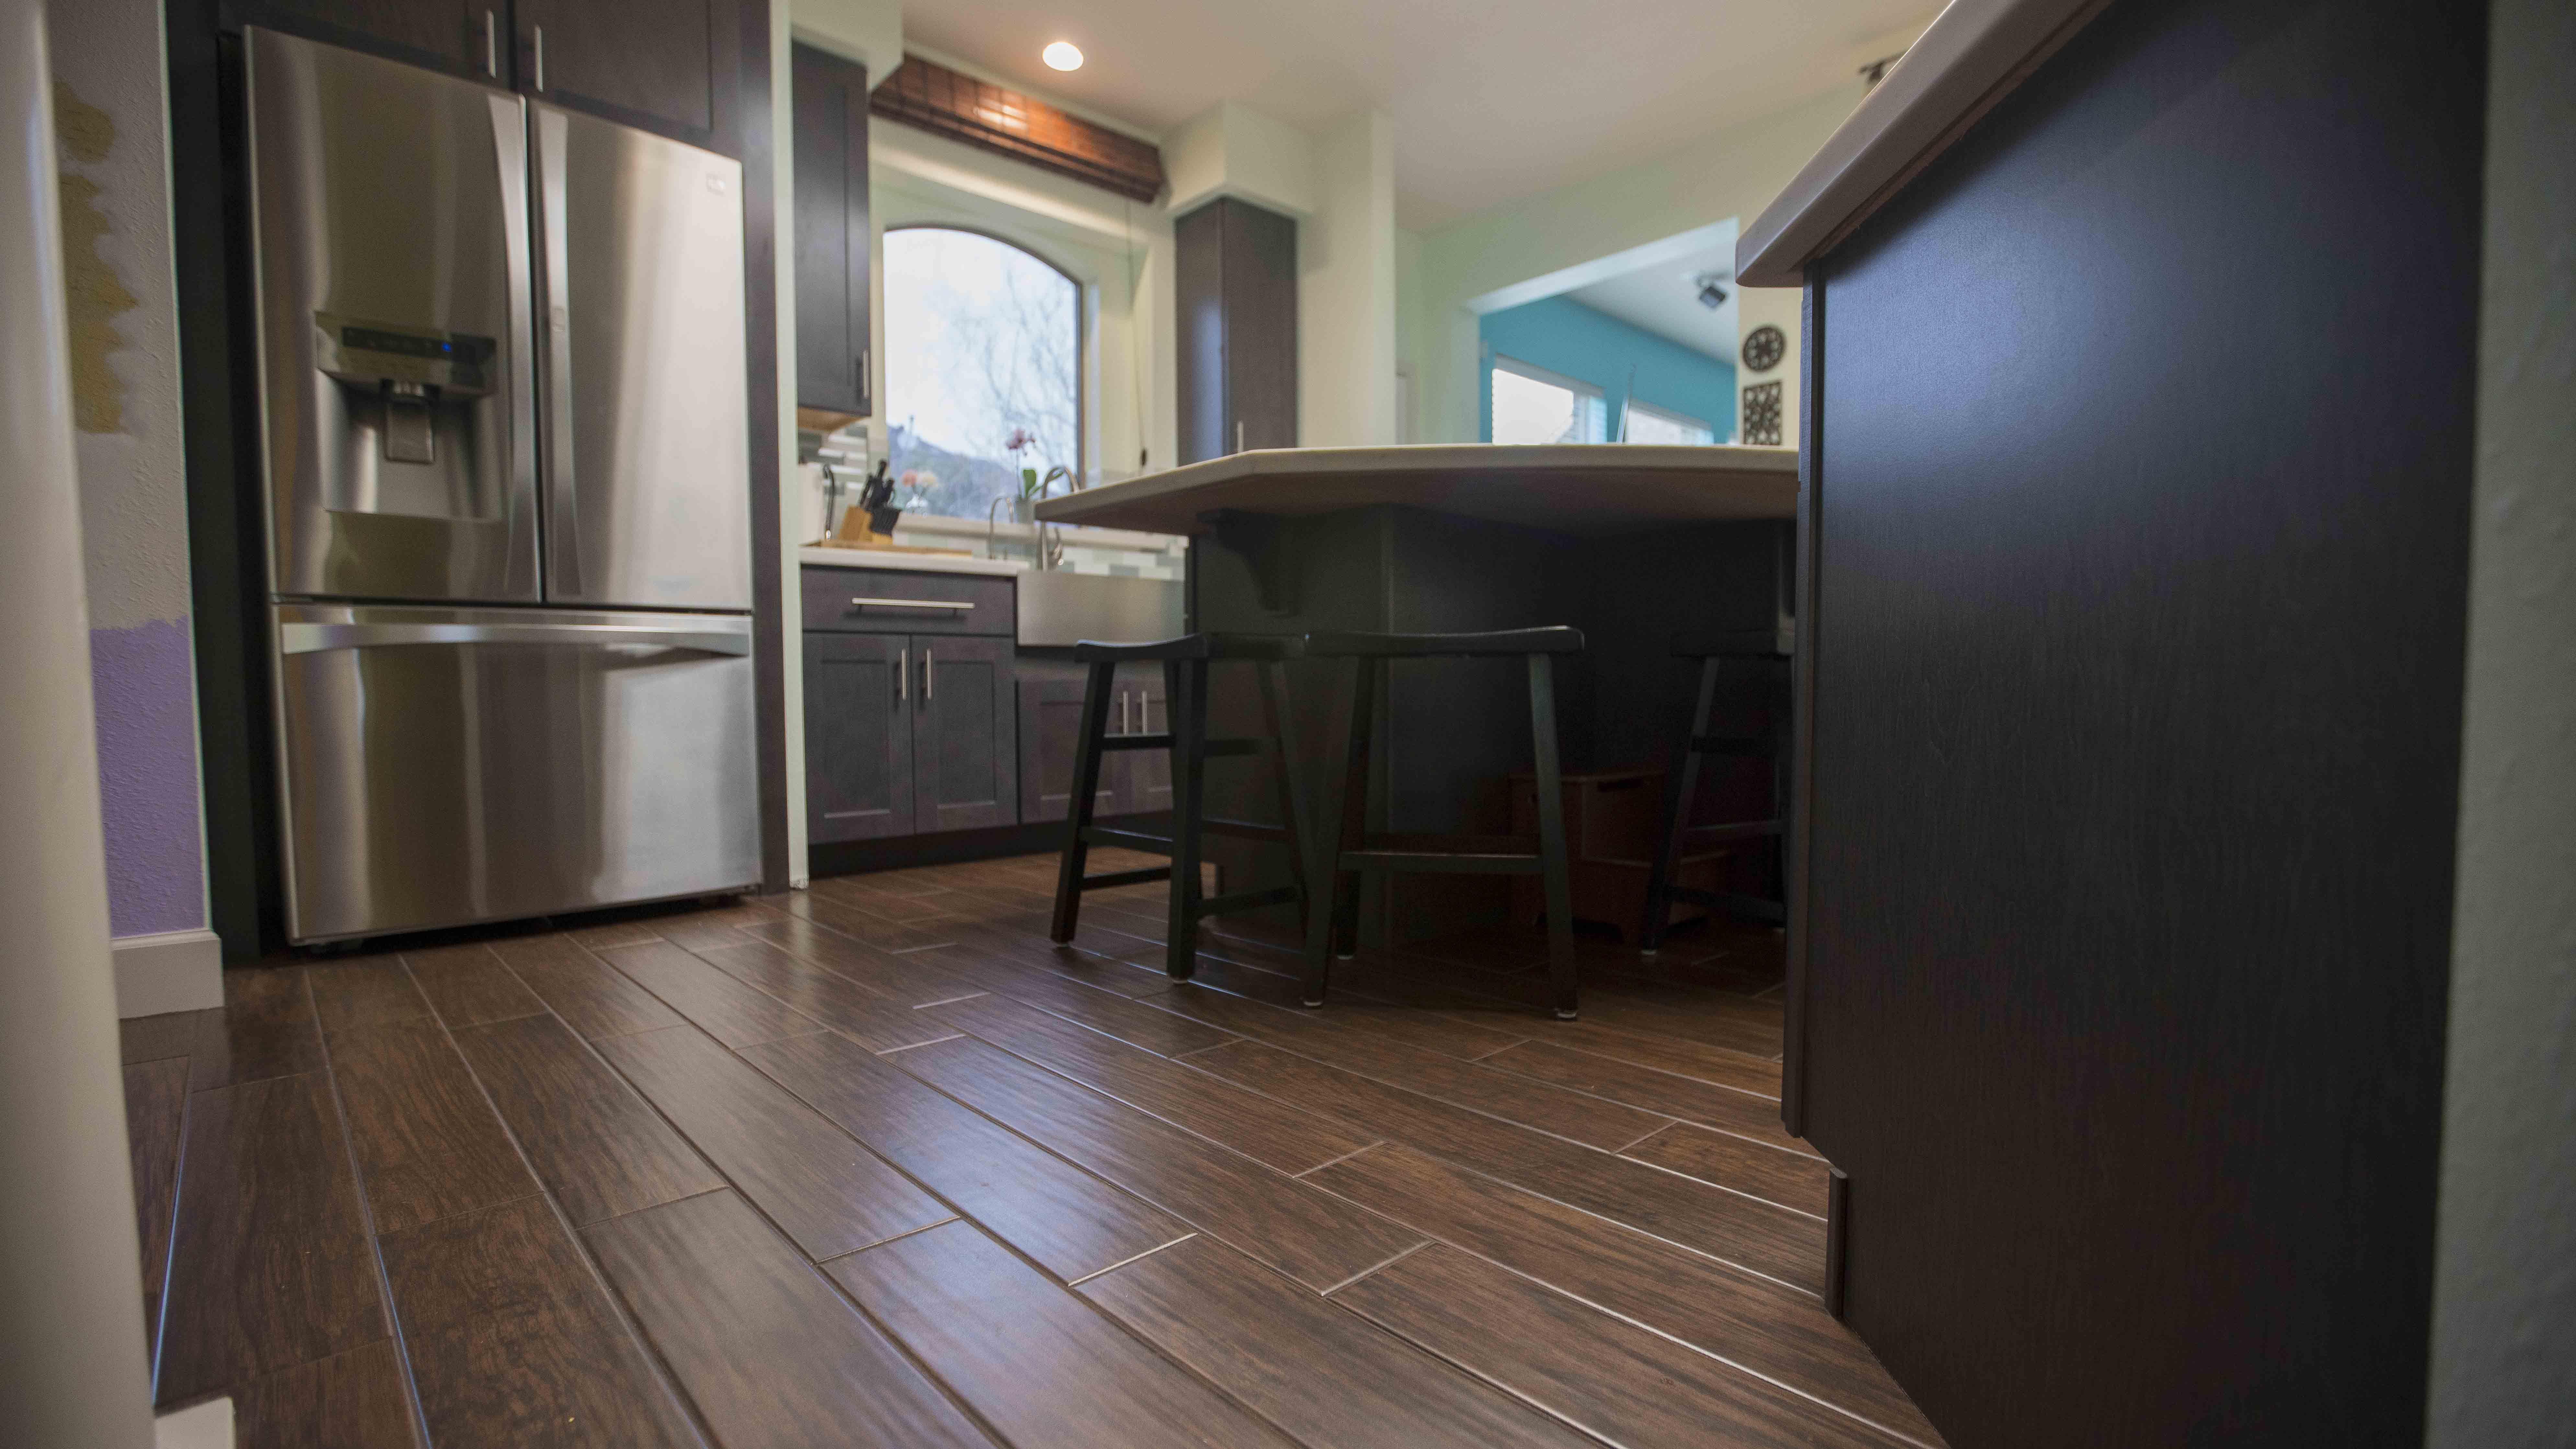 Kitchen Remodeling Houston Tx Bath Remodelling Usa Cabinet Store Kitchen Bar Stools Kitchen Decor Decor